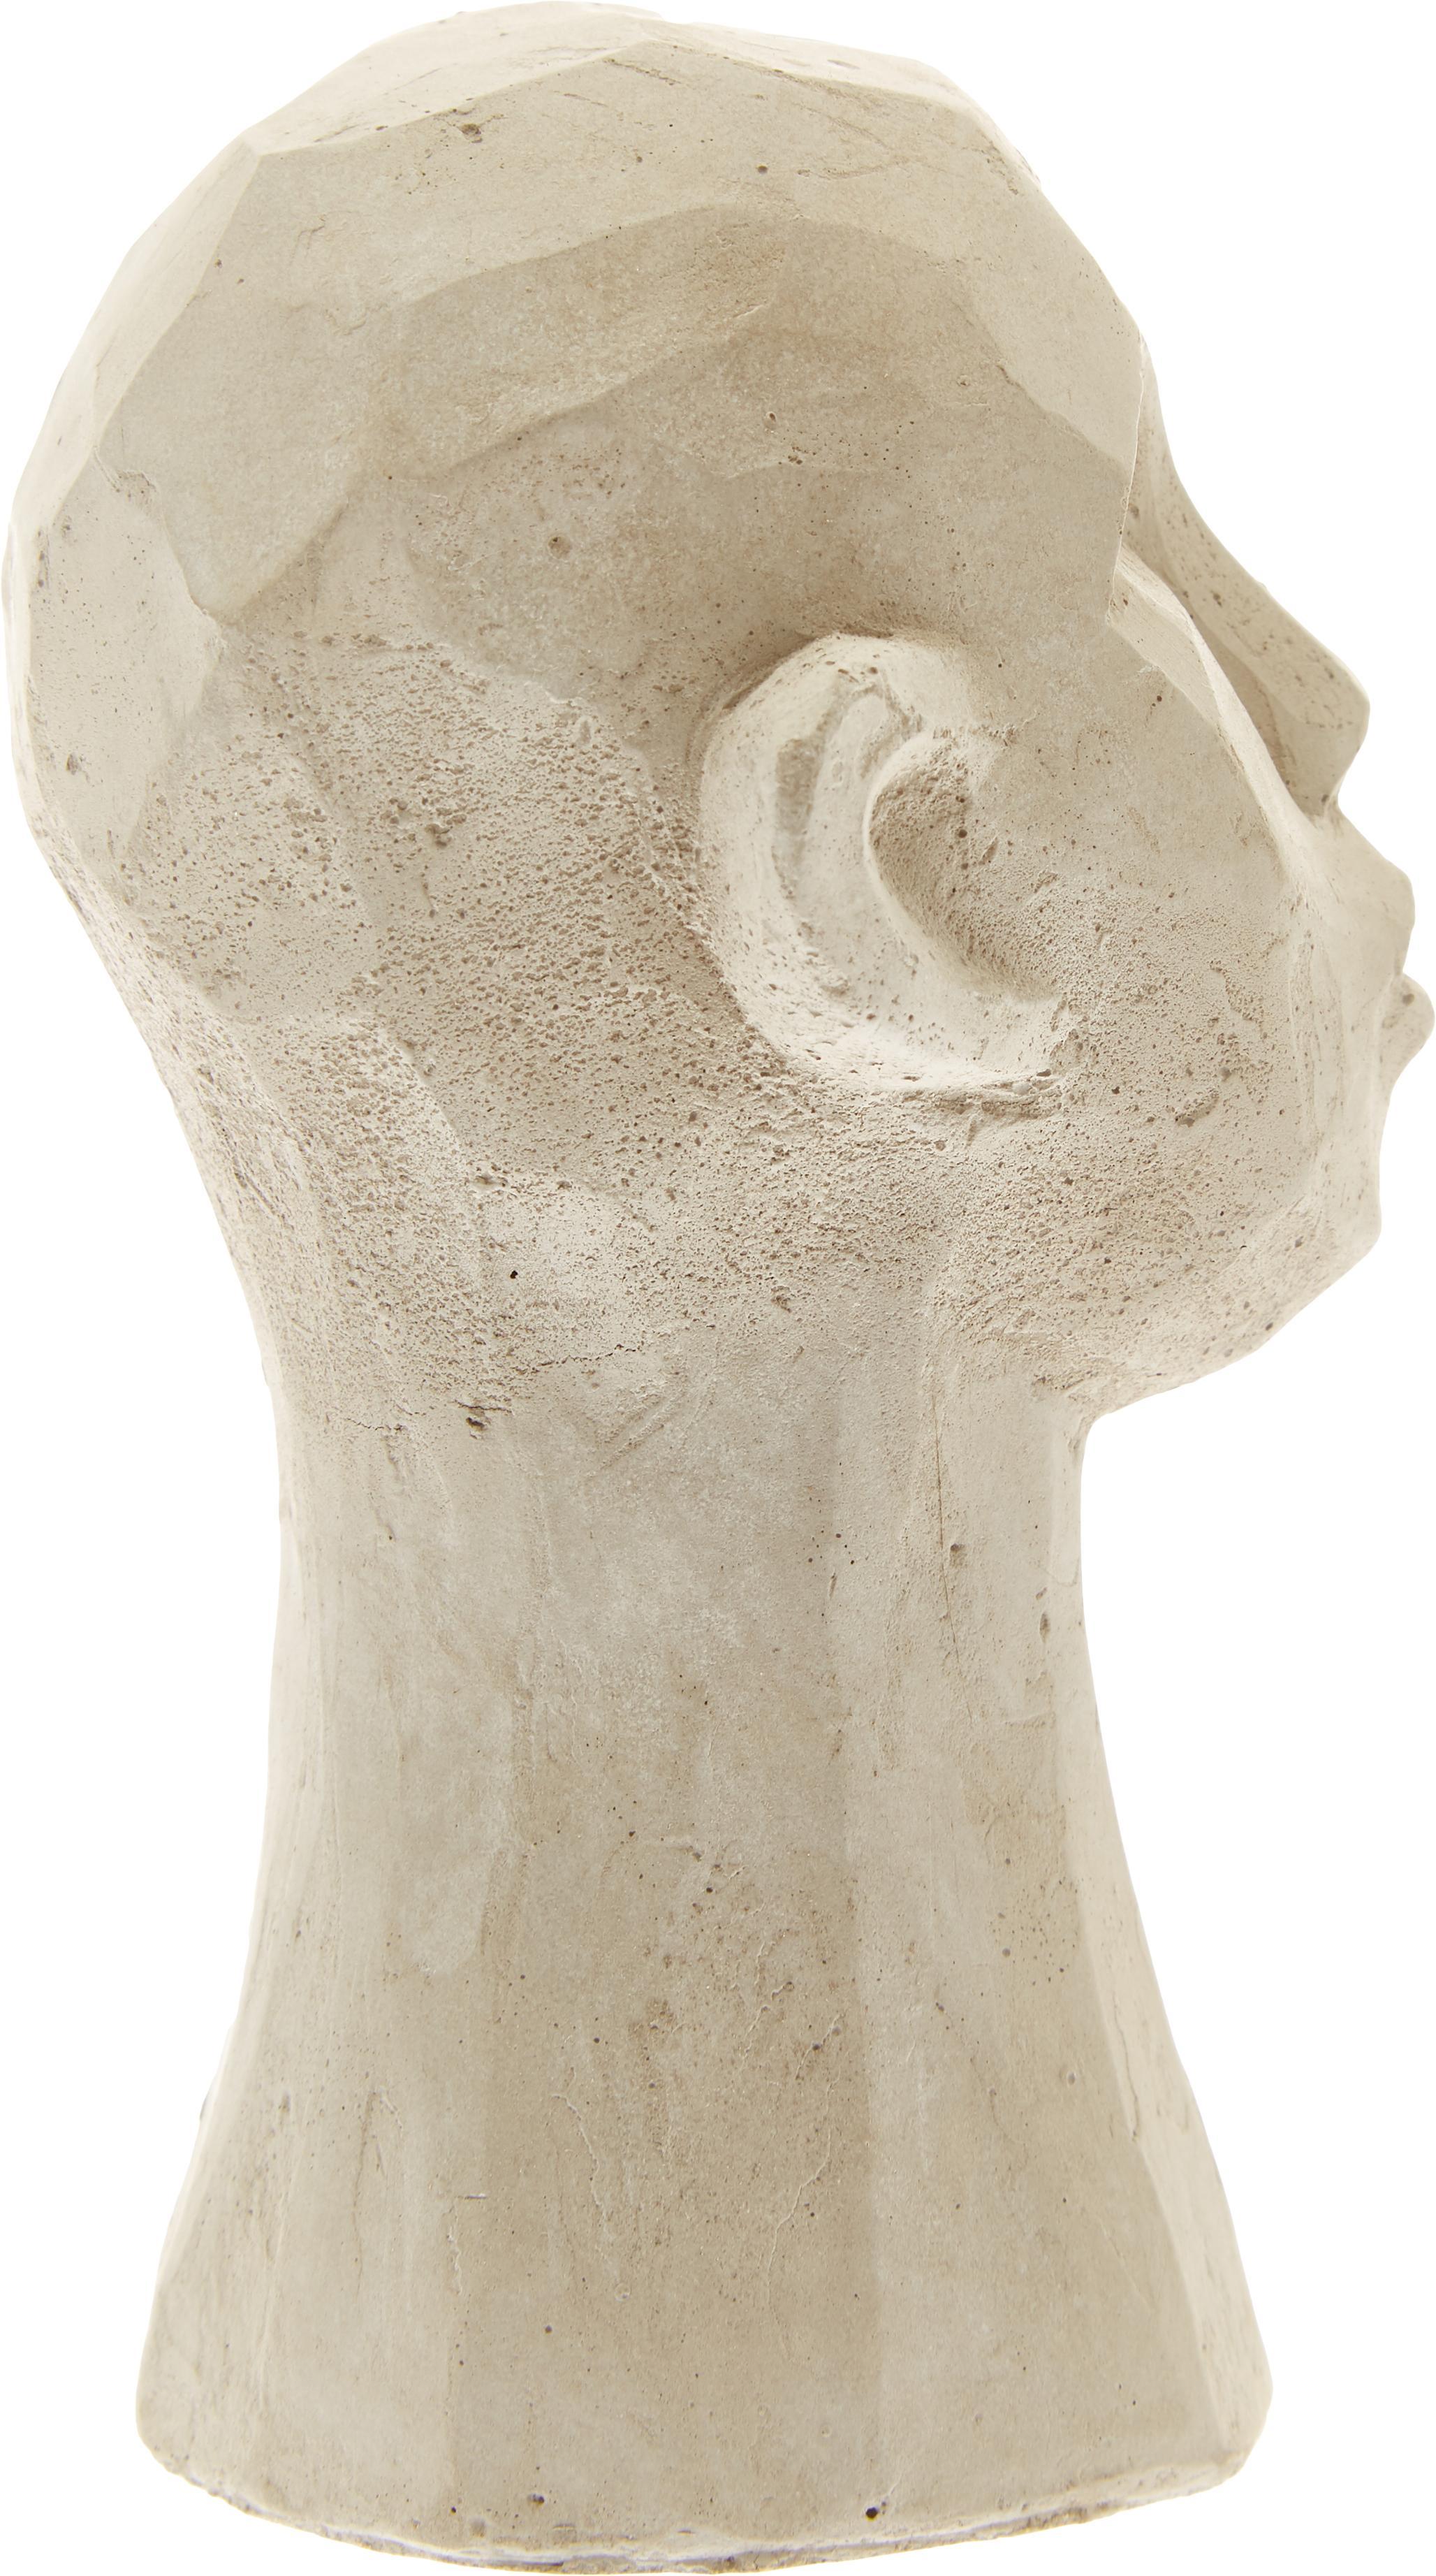 Set de figuras decorativas Figure Head, 3pzas., Cemento, Blanco, marrón, gris, Ø 9x Al 15 cm